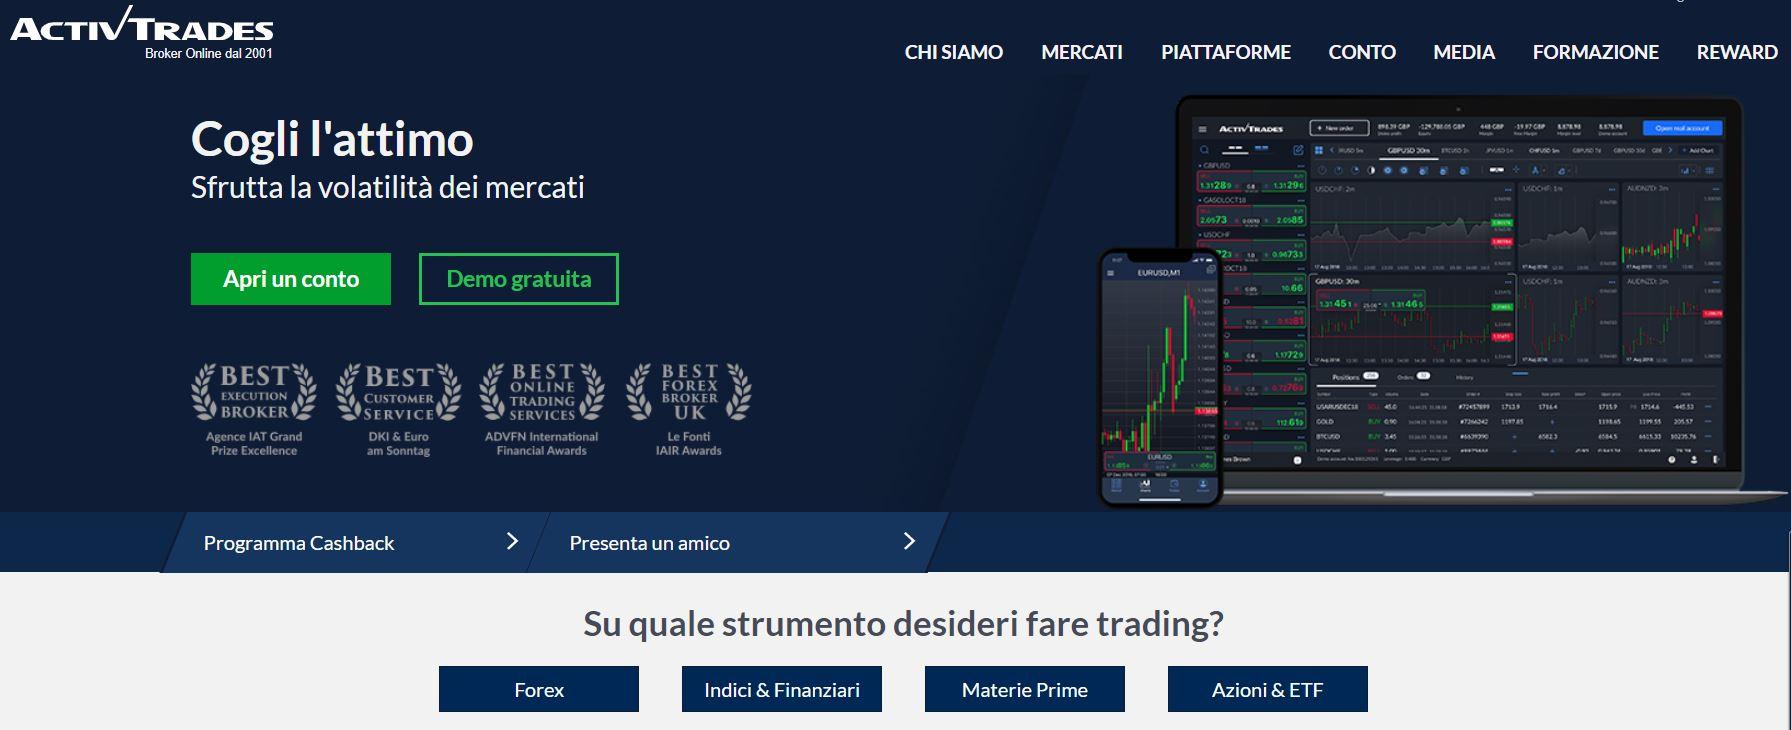 activtrades piattaforma trading per principianti